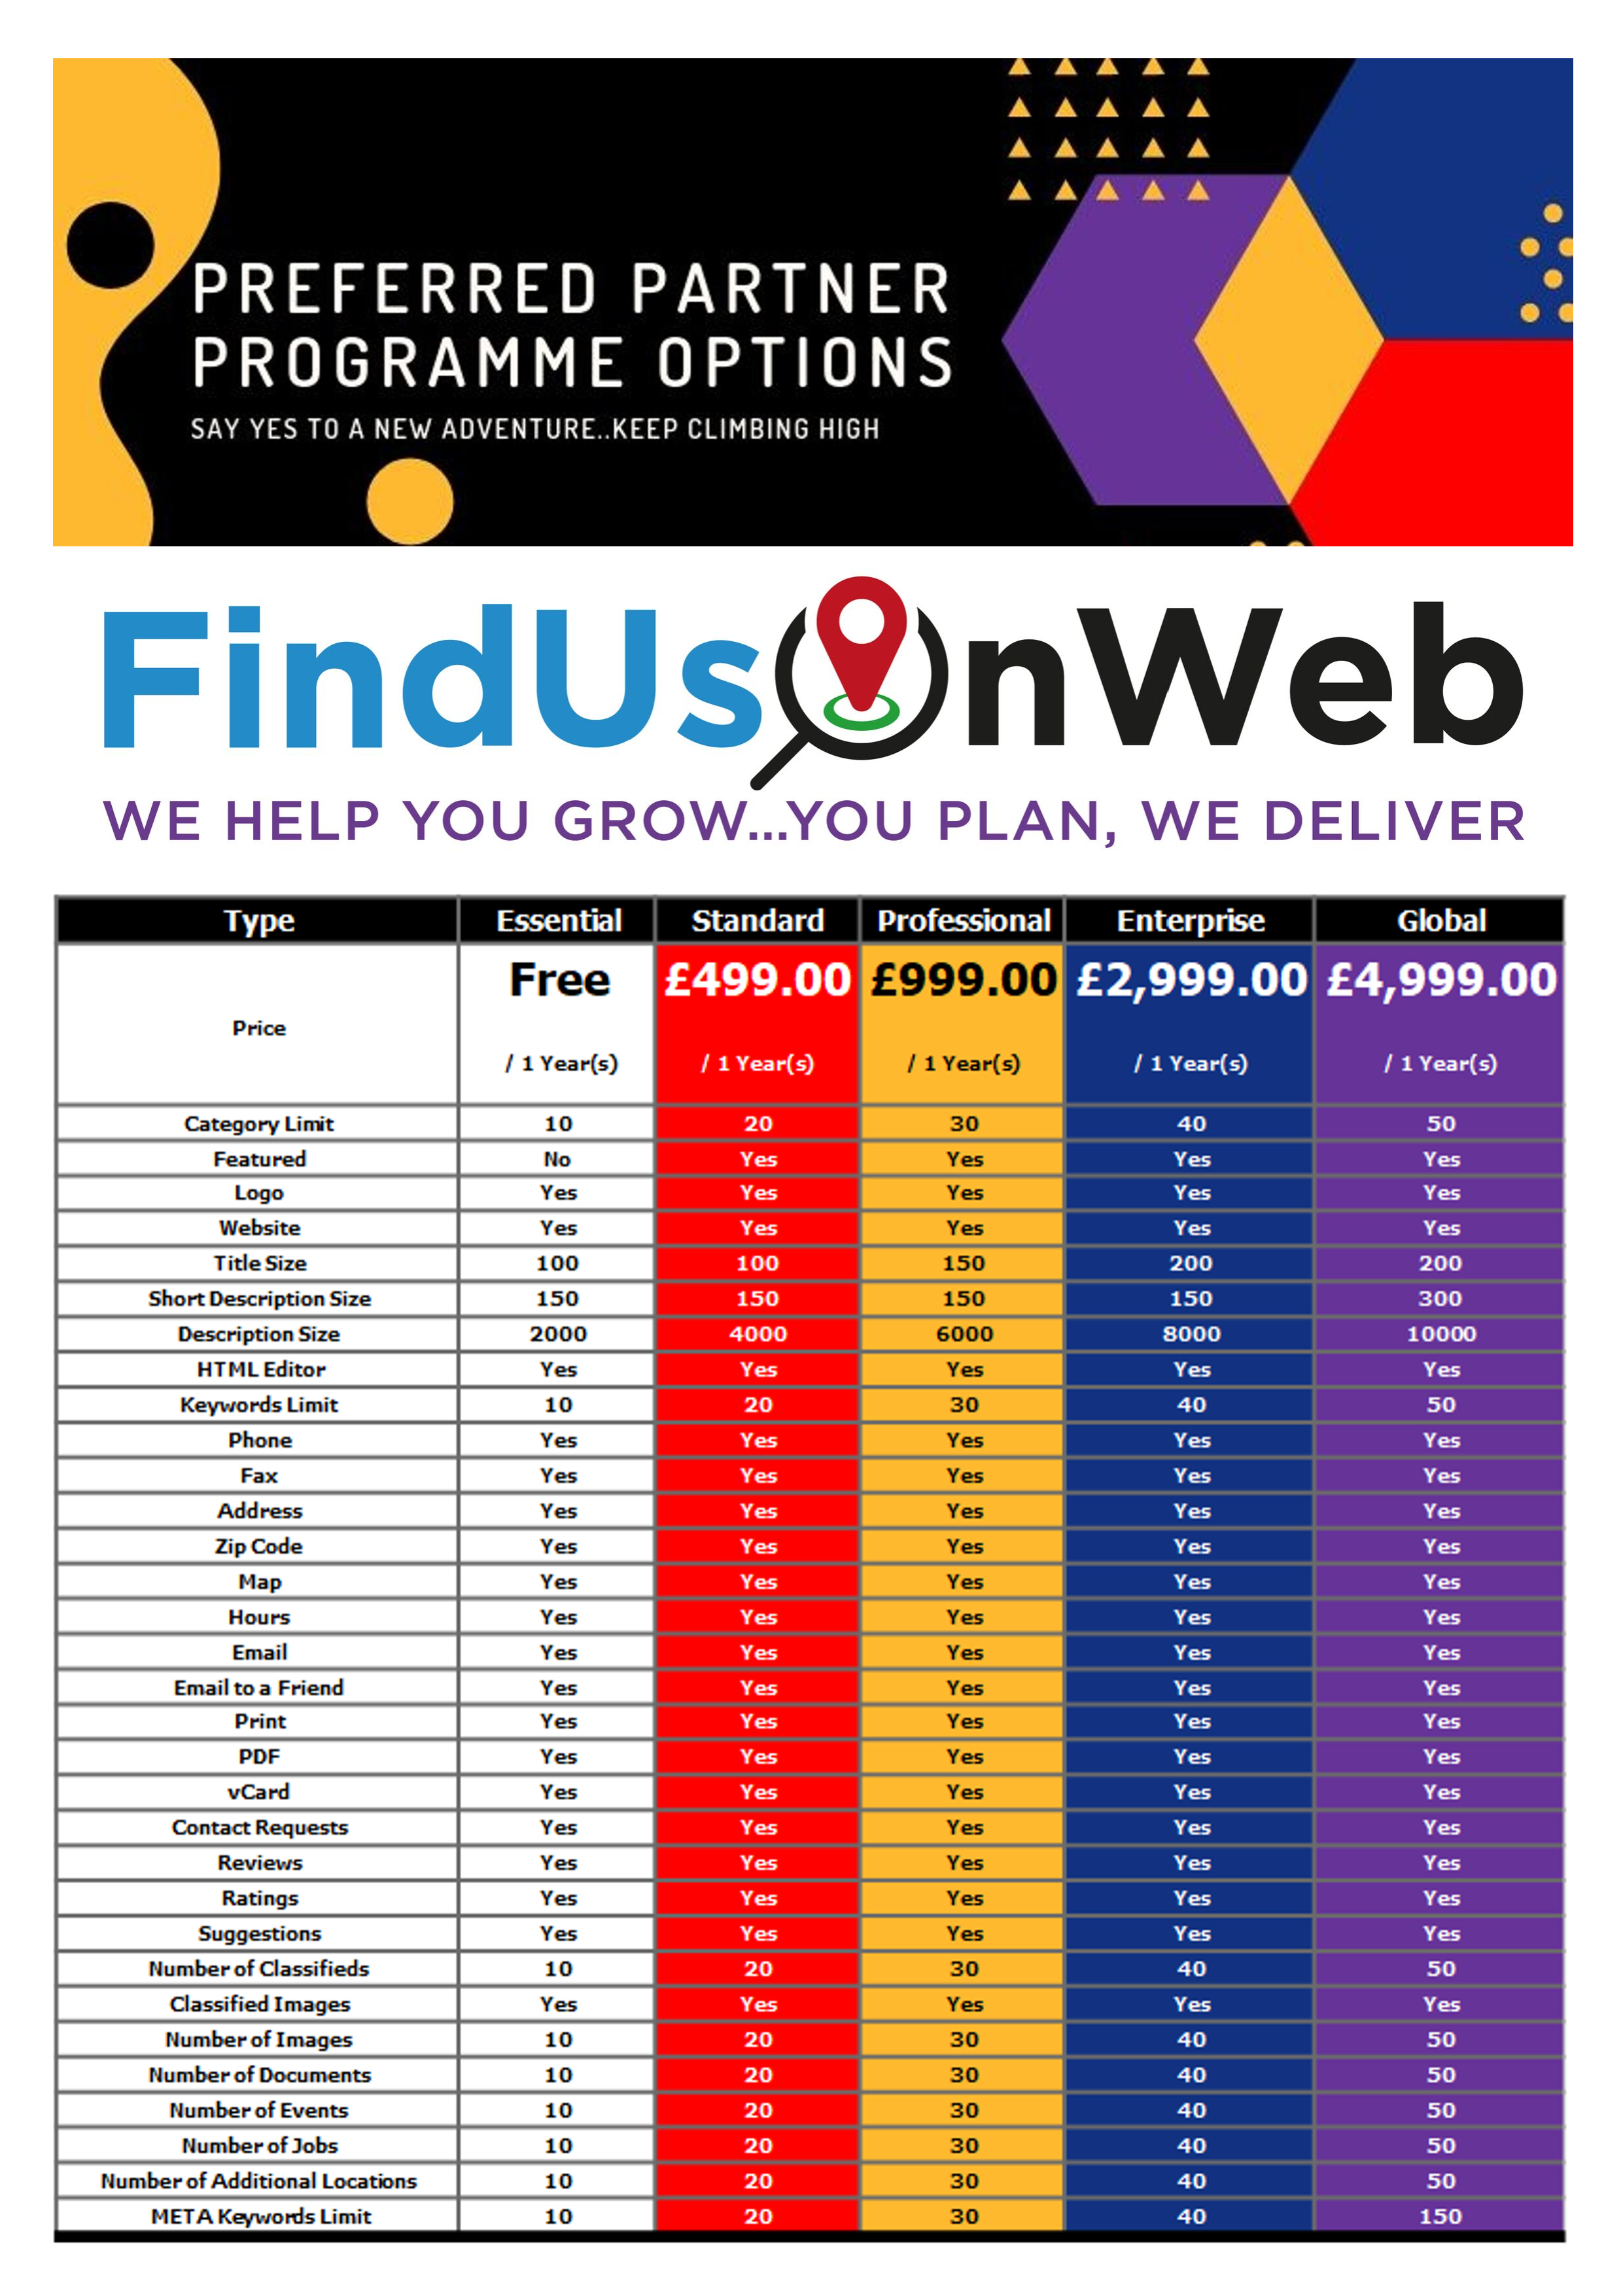 Preferred Partner Programme Options